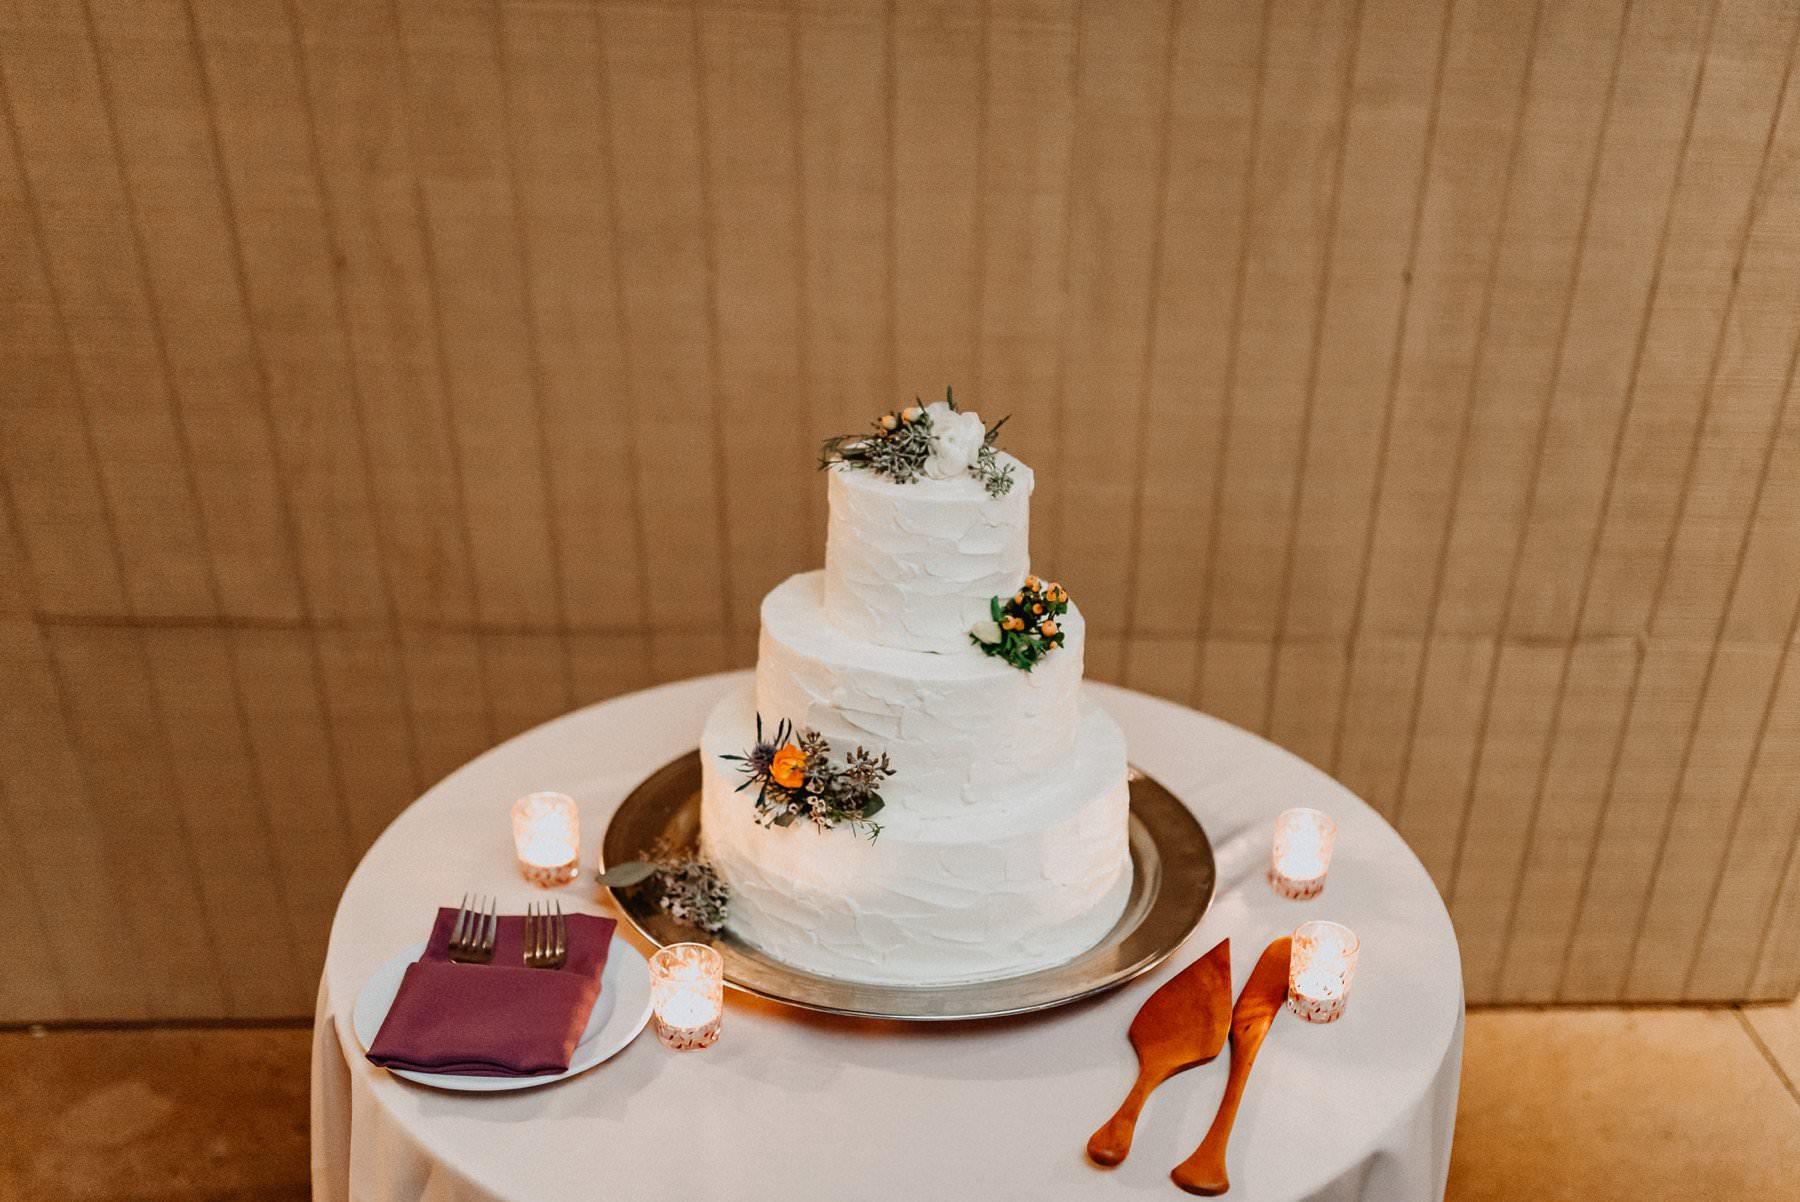 John_James_Audubon_Center_wedding-75.jpg